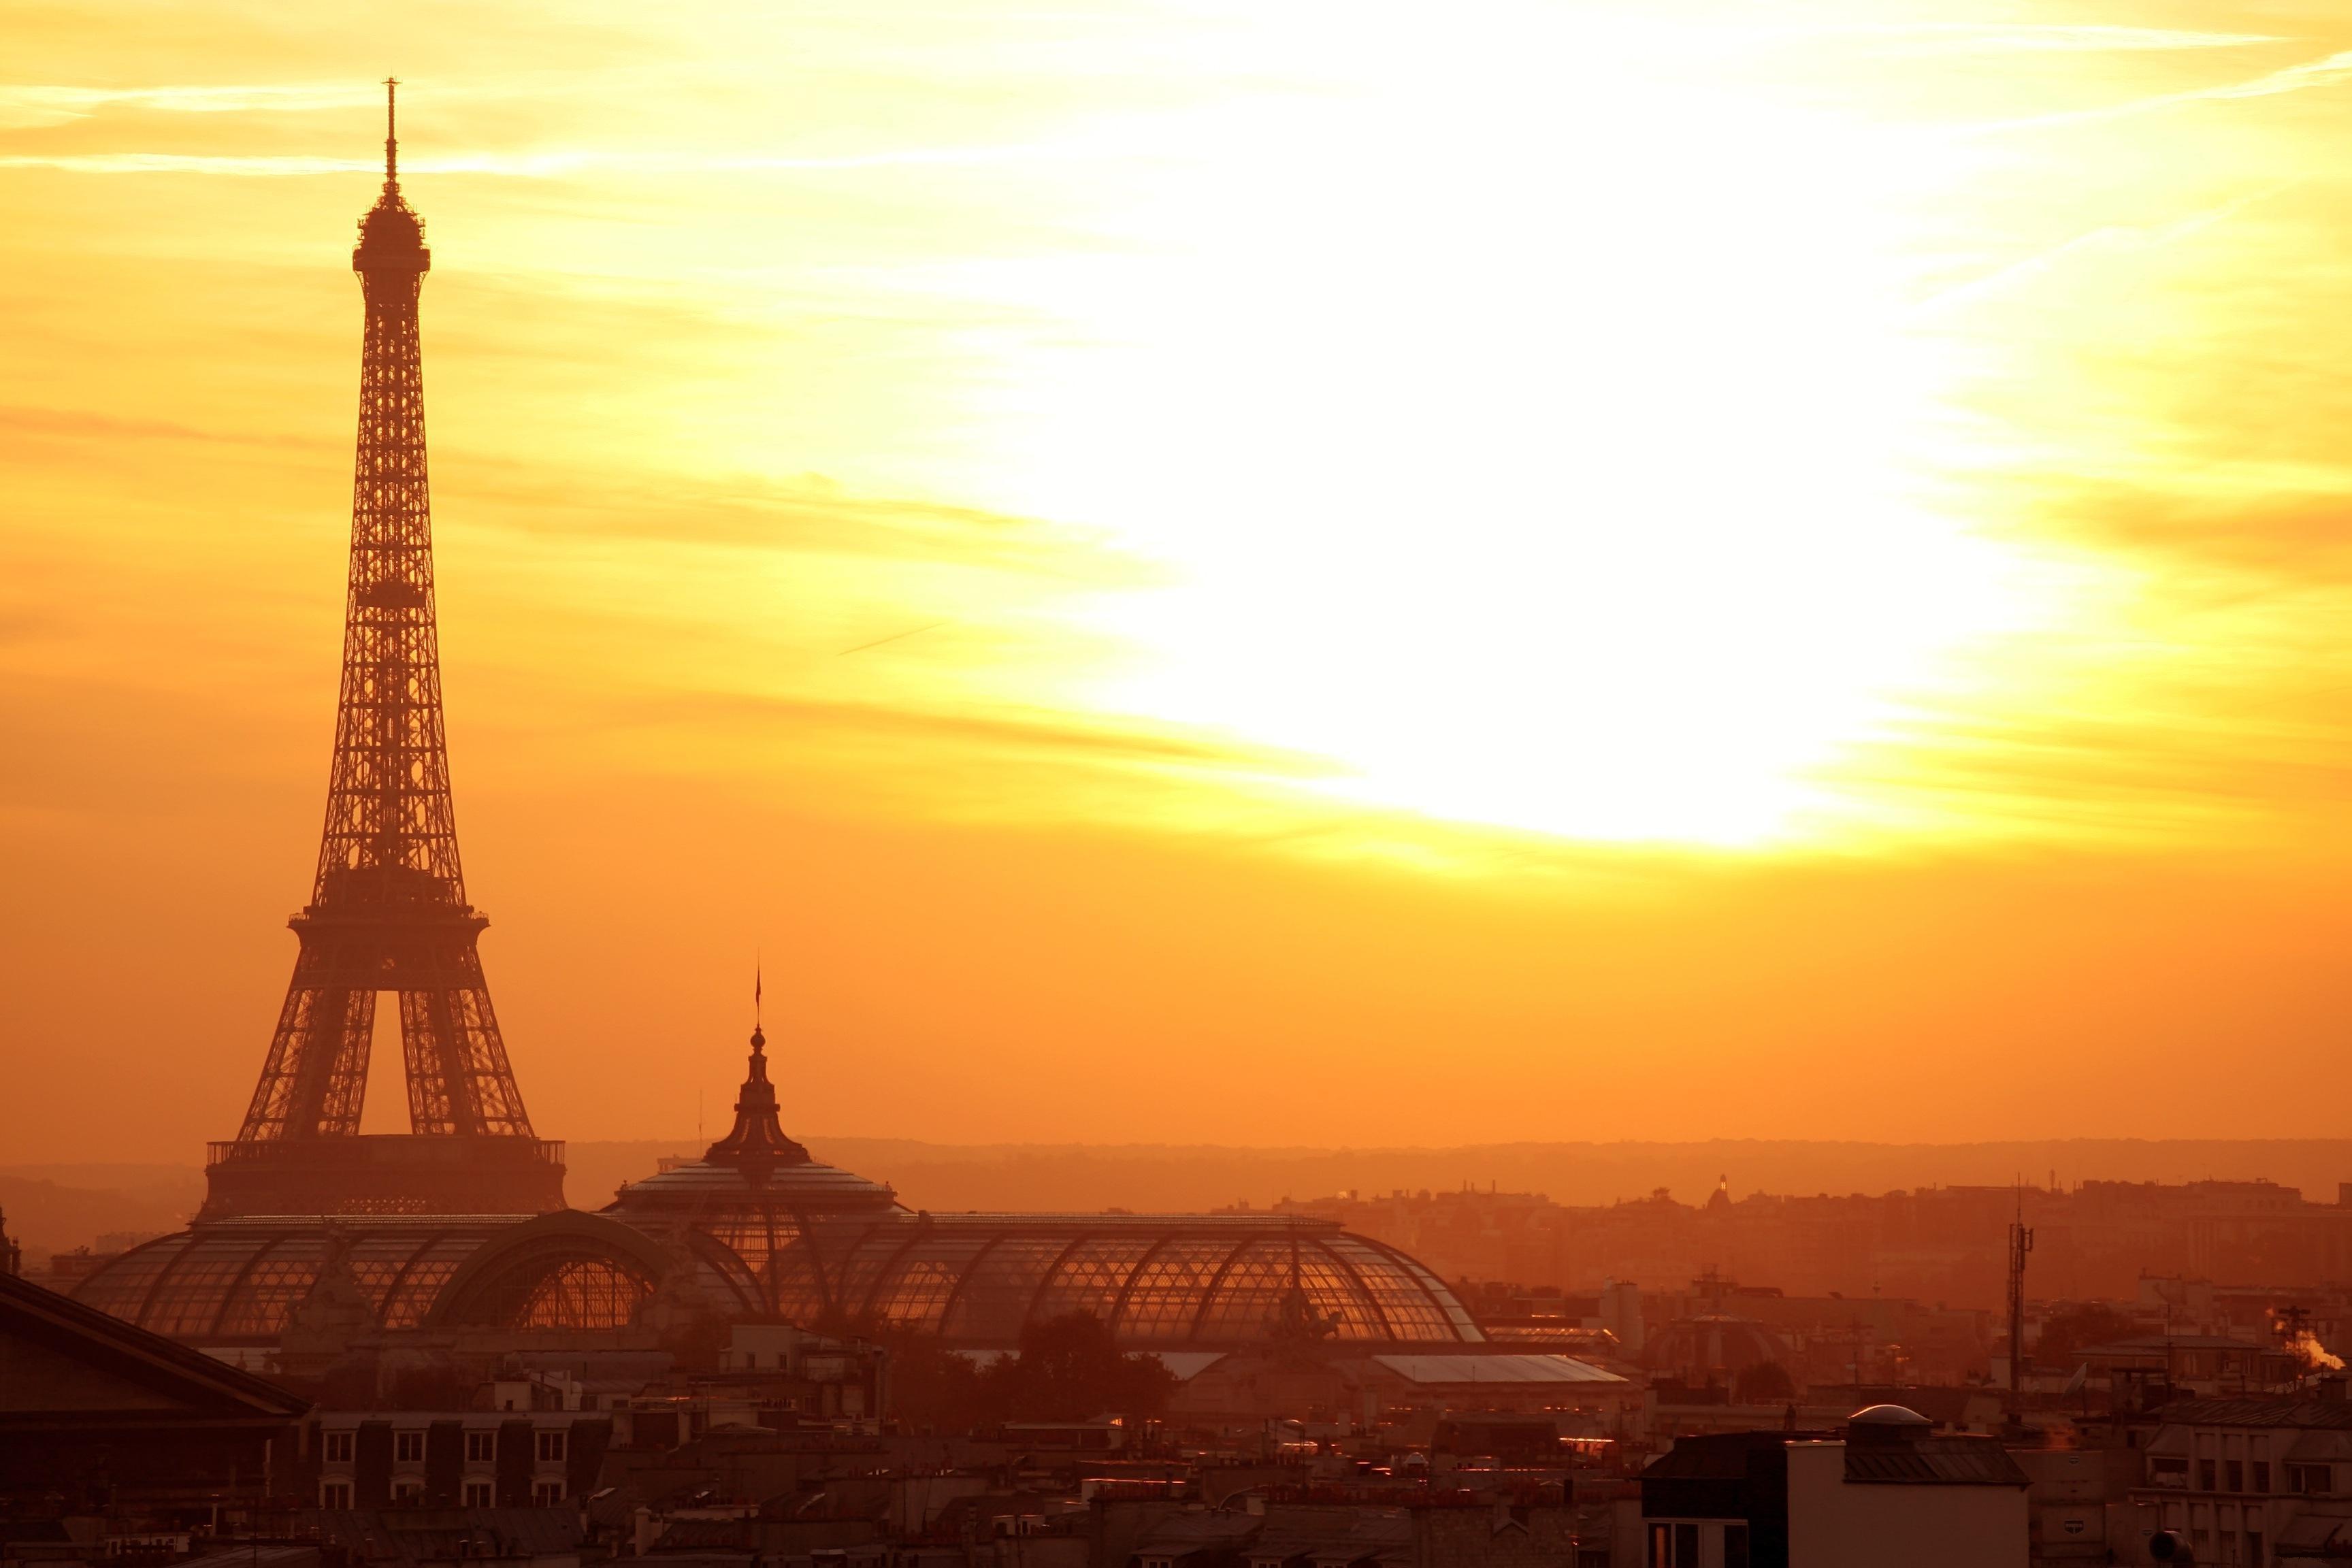 Eiffel Tower Backgrounds - WallpaperSafari